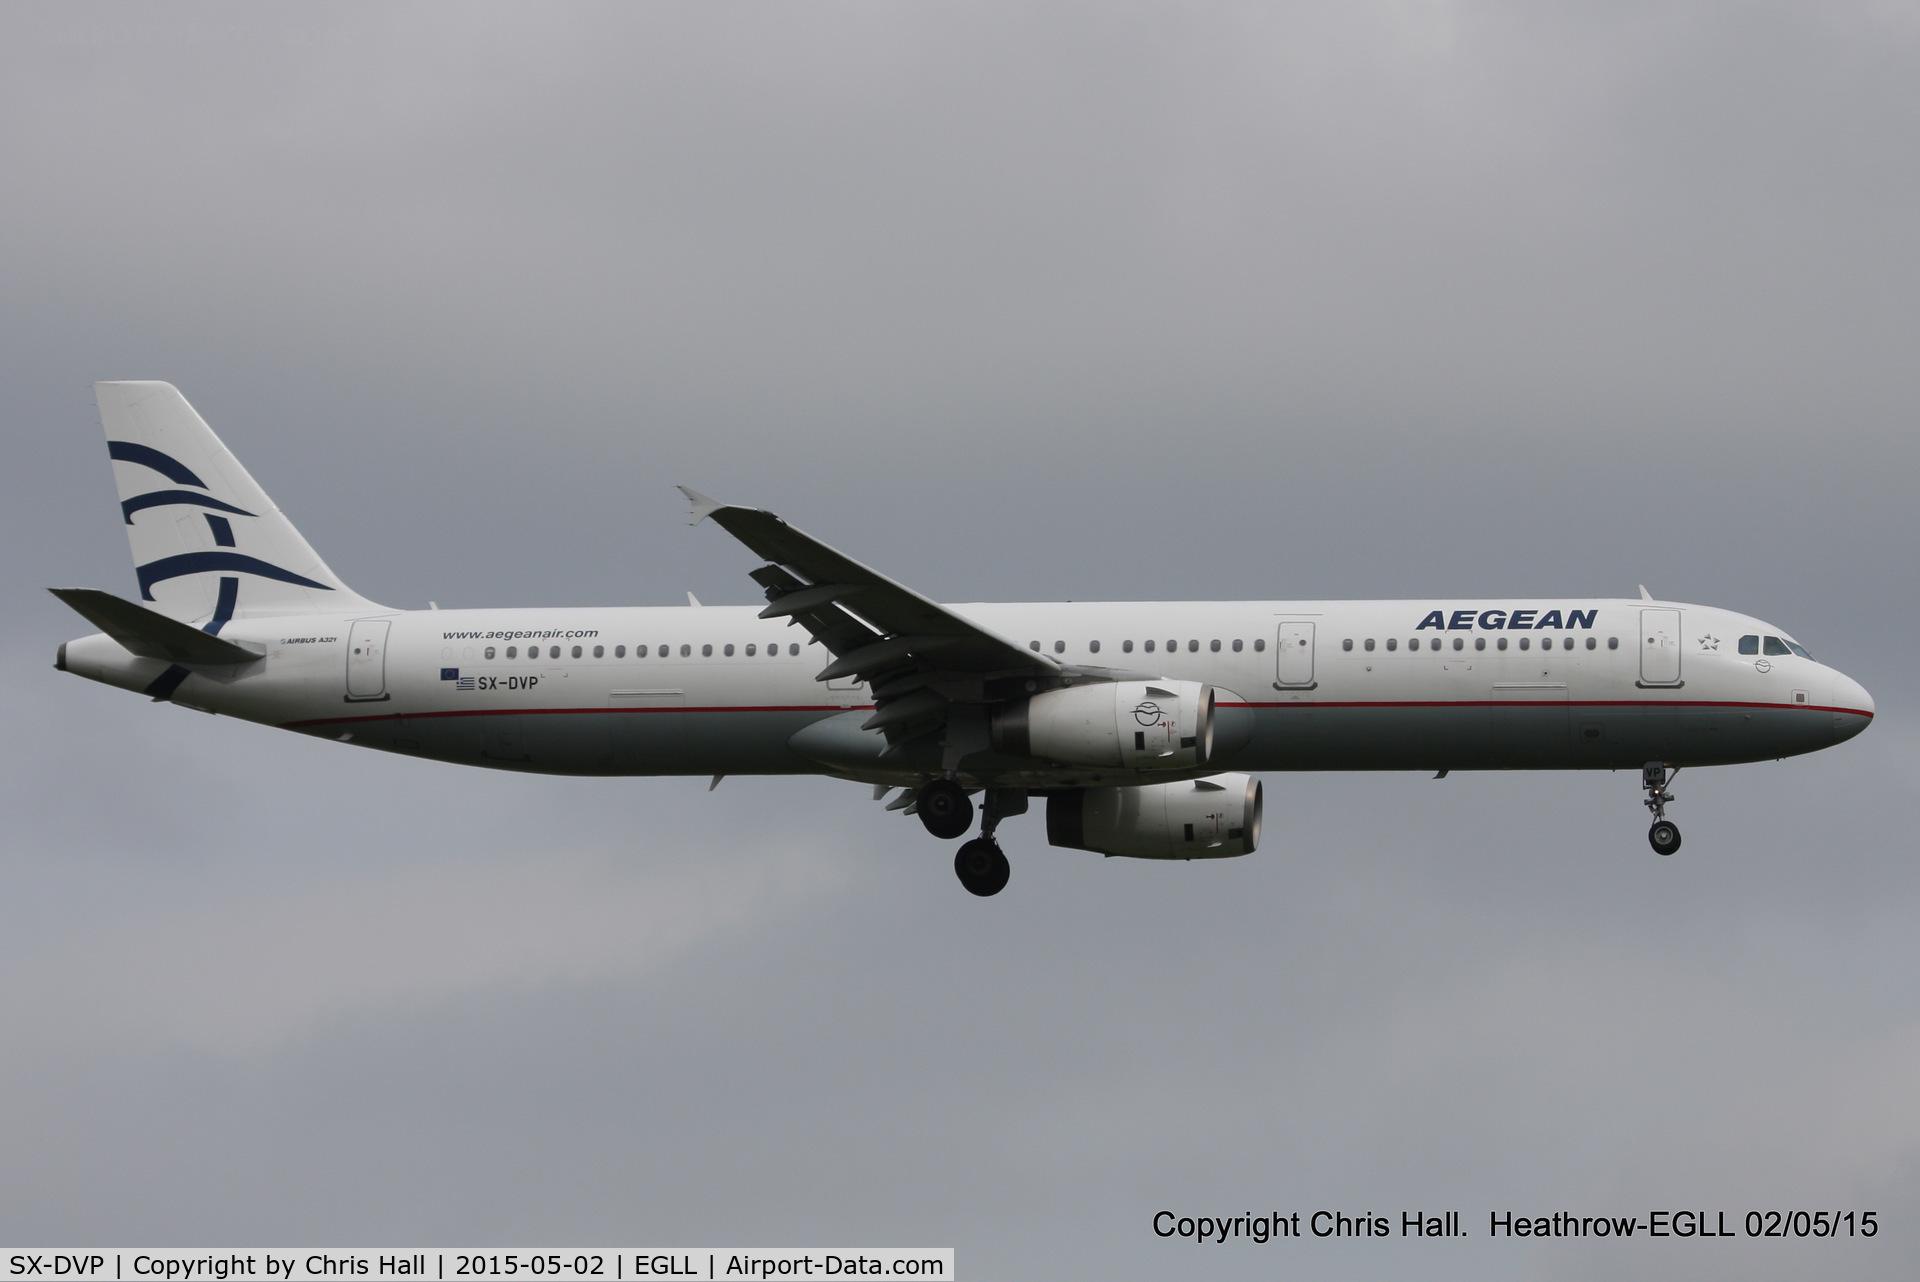 SX-DVP, 2008 Airbus A321-232 C/N 3527, Aegean Airlines